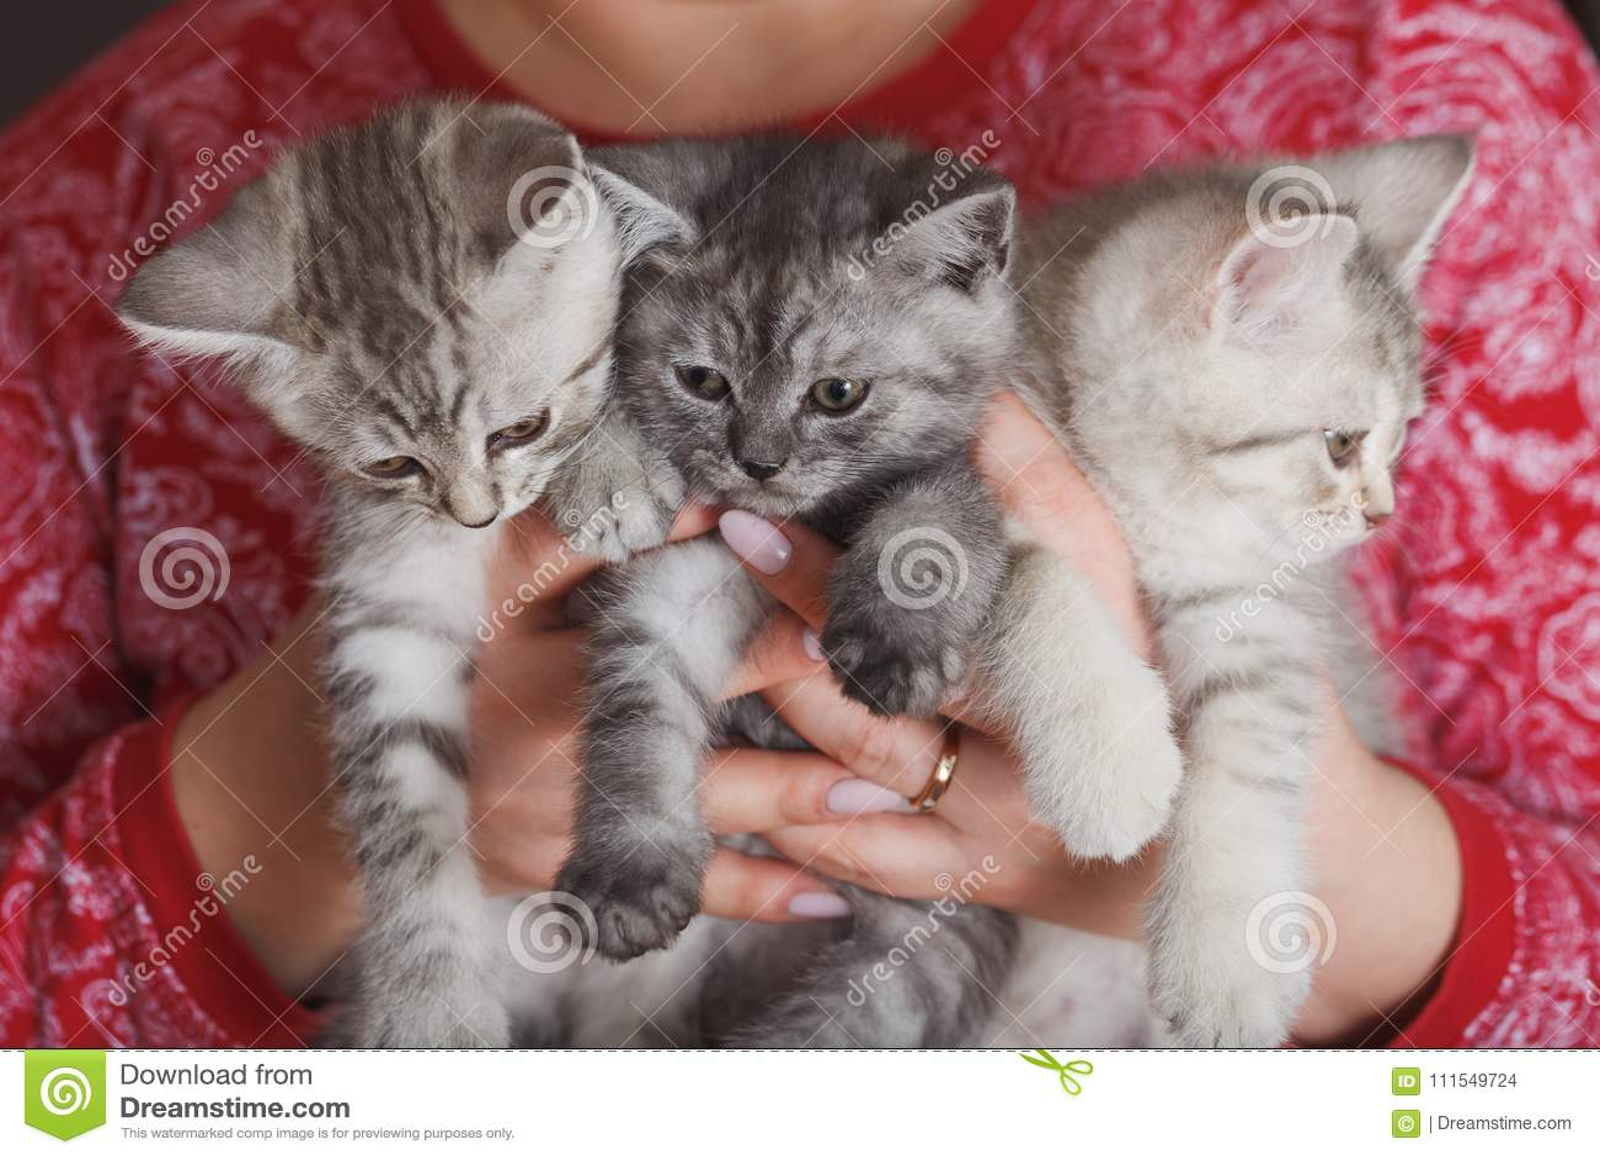 Vrouw in een rood jasje die klein bont grijs katje drie houden